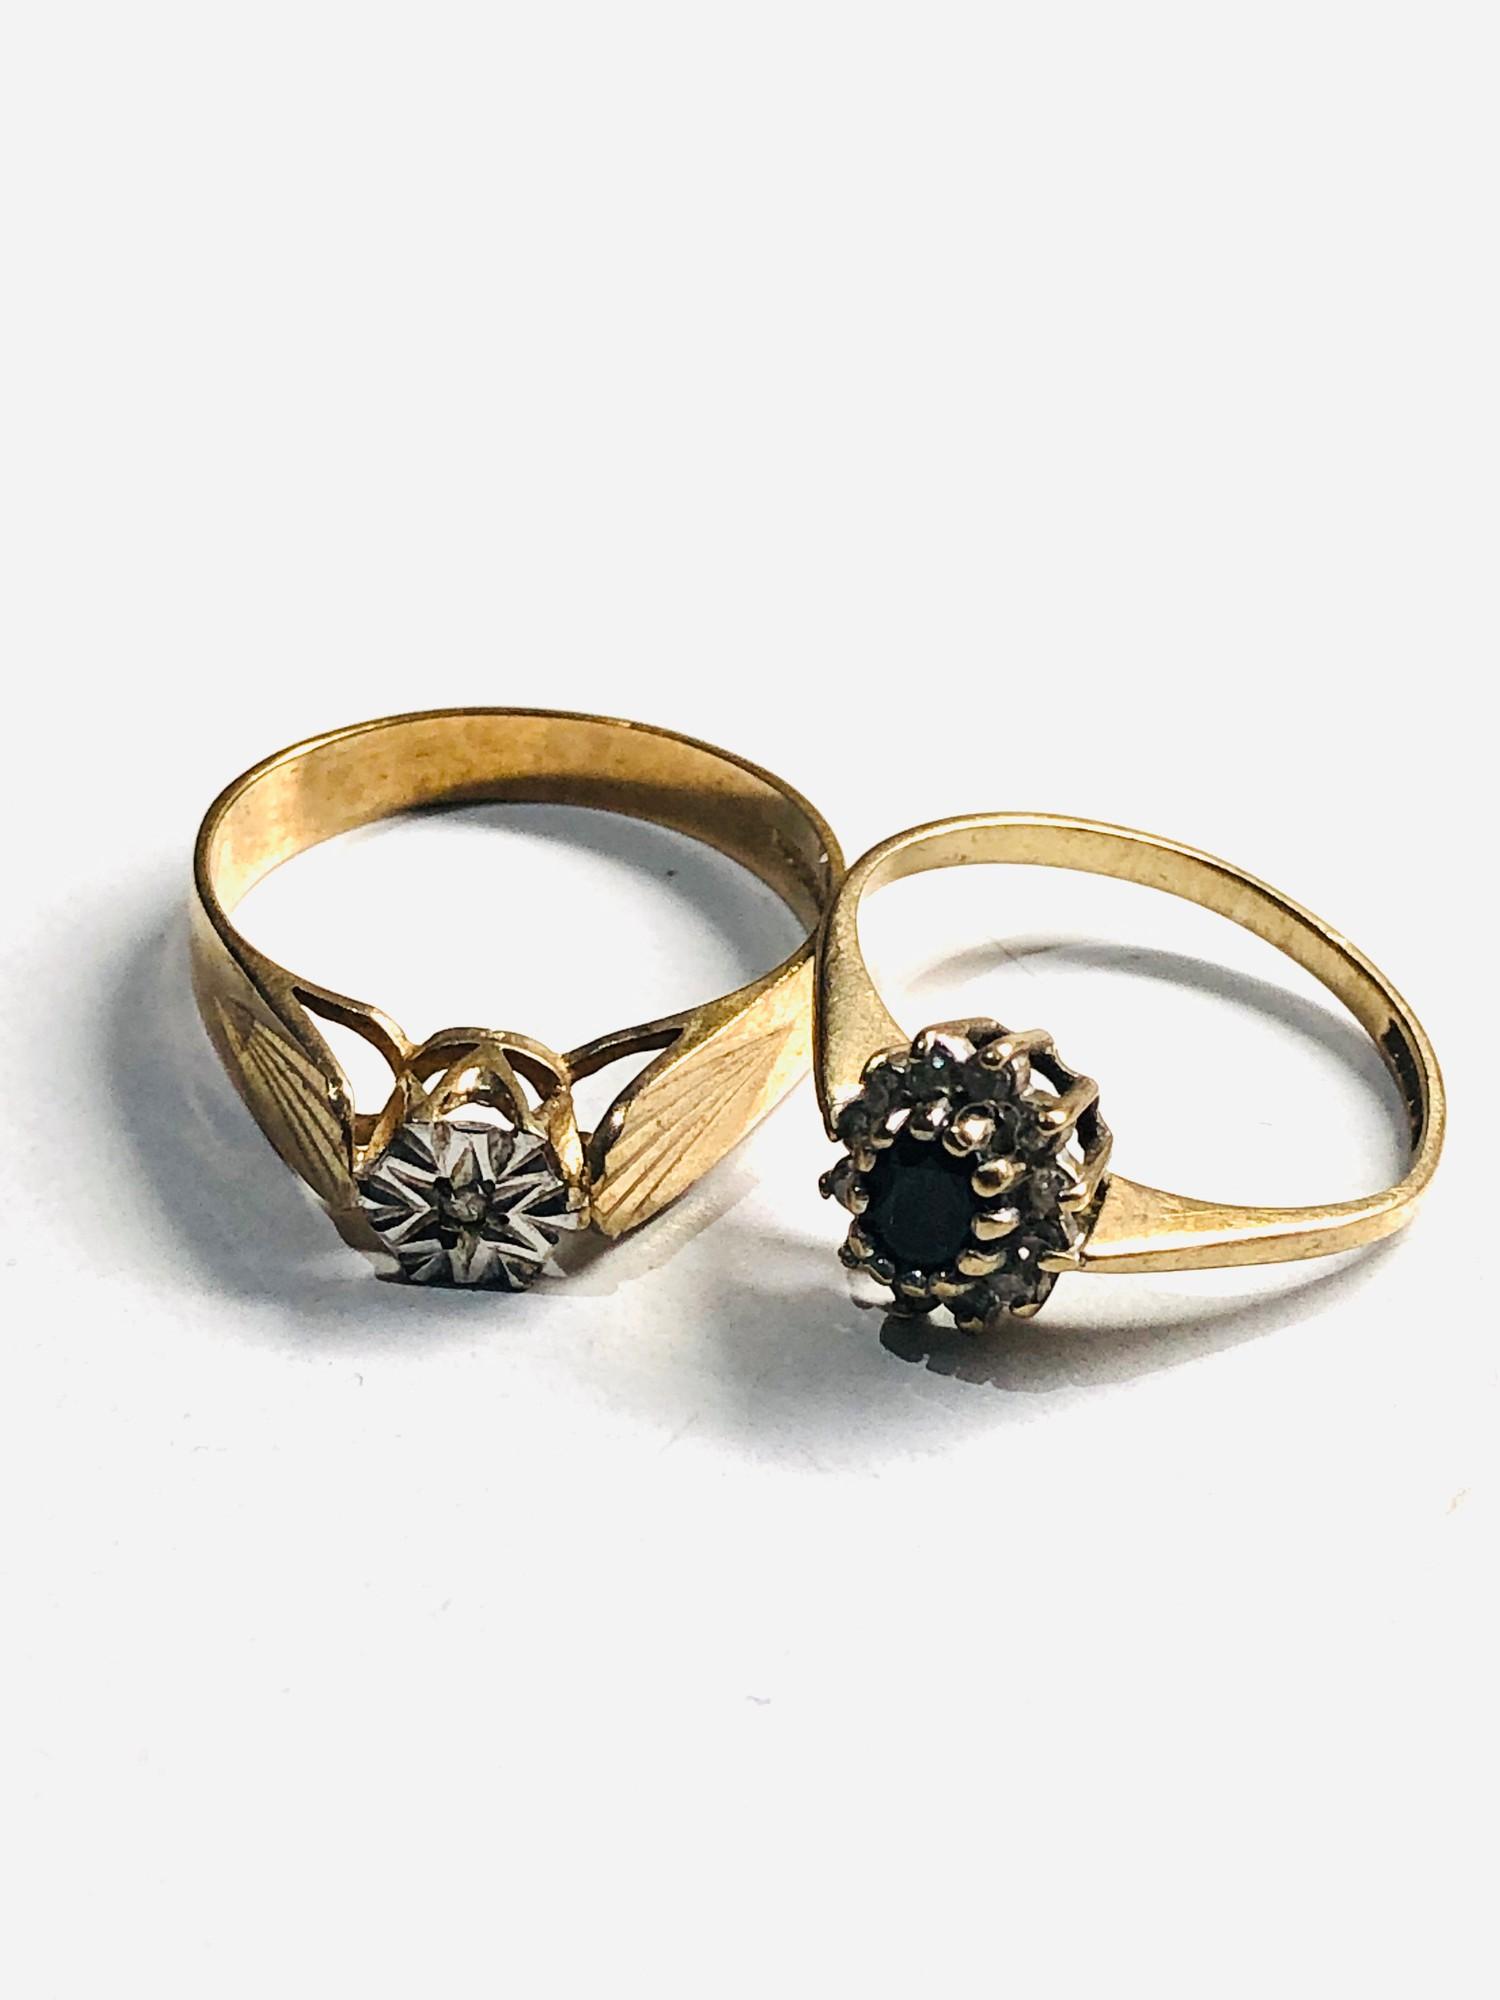 2 x 9ct Gold diamond detail rings 3.2g - Image 2 of 3